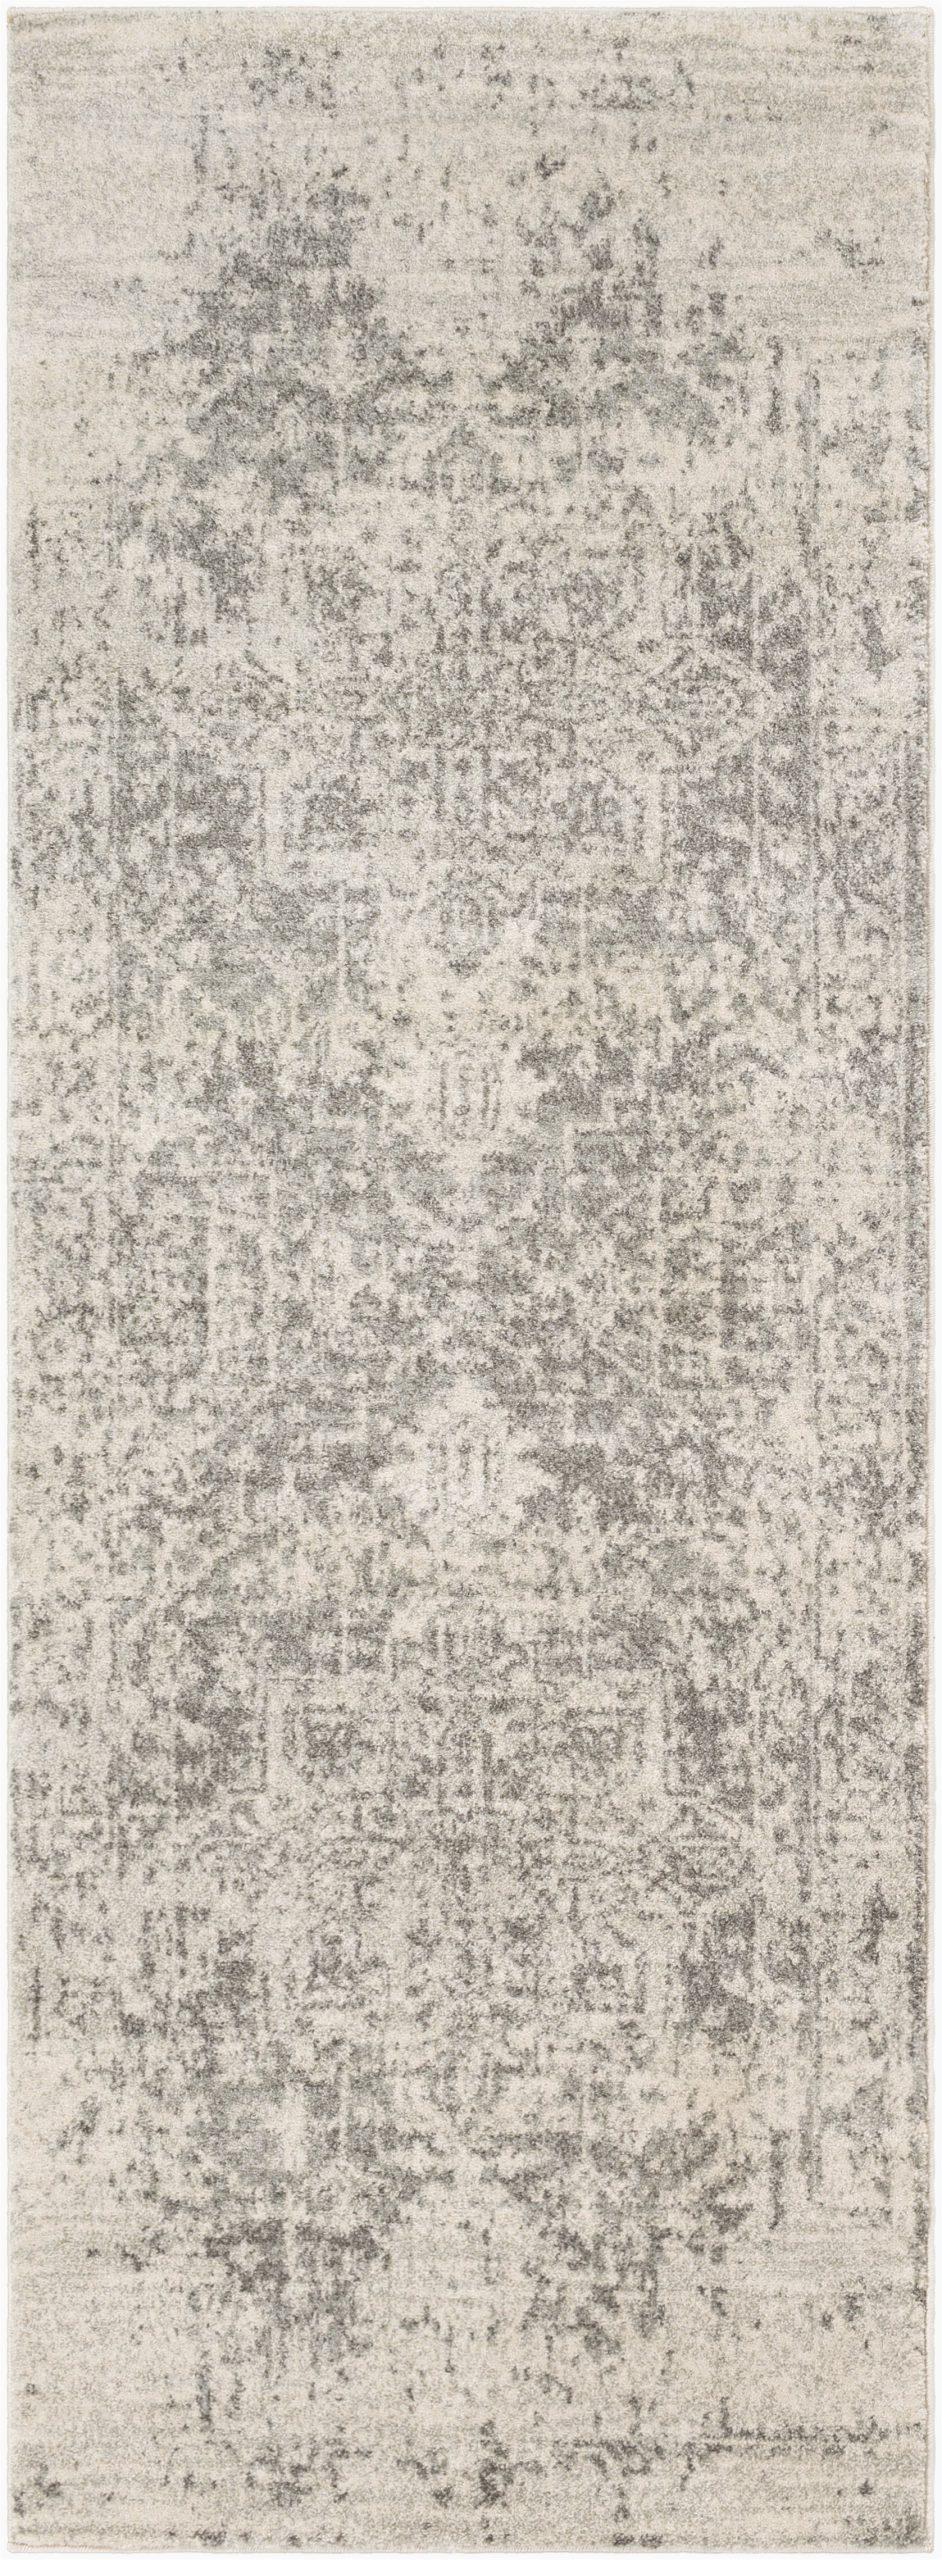 surya harput classic black hap 1024 area rug